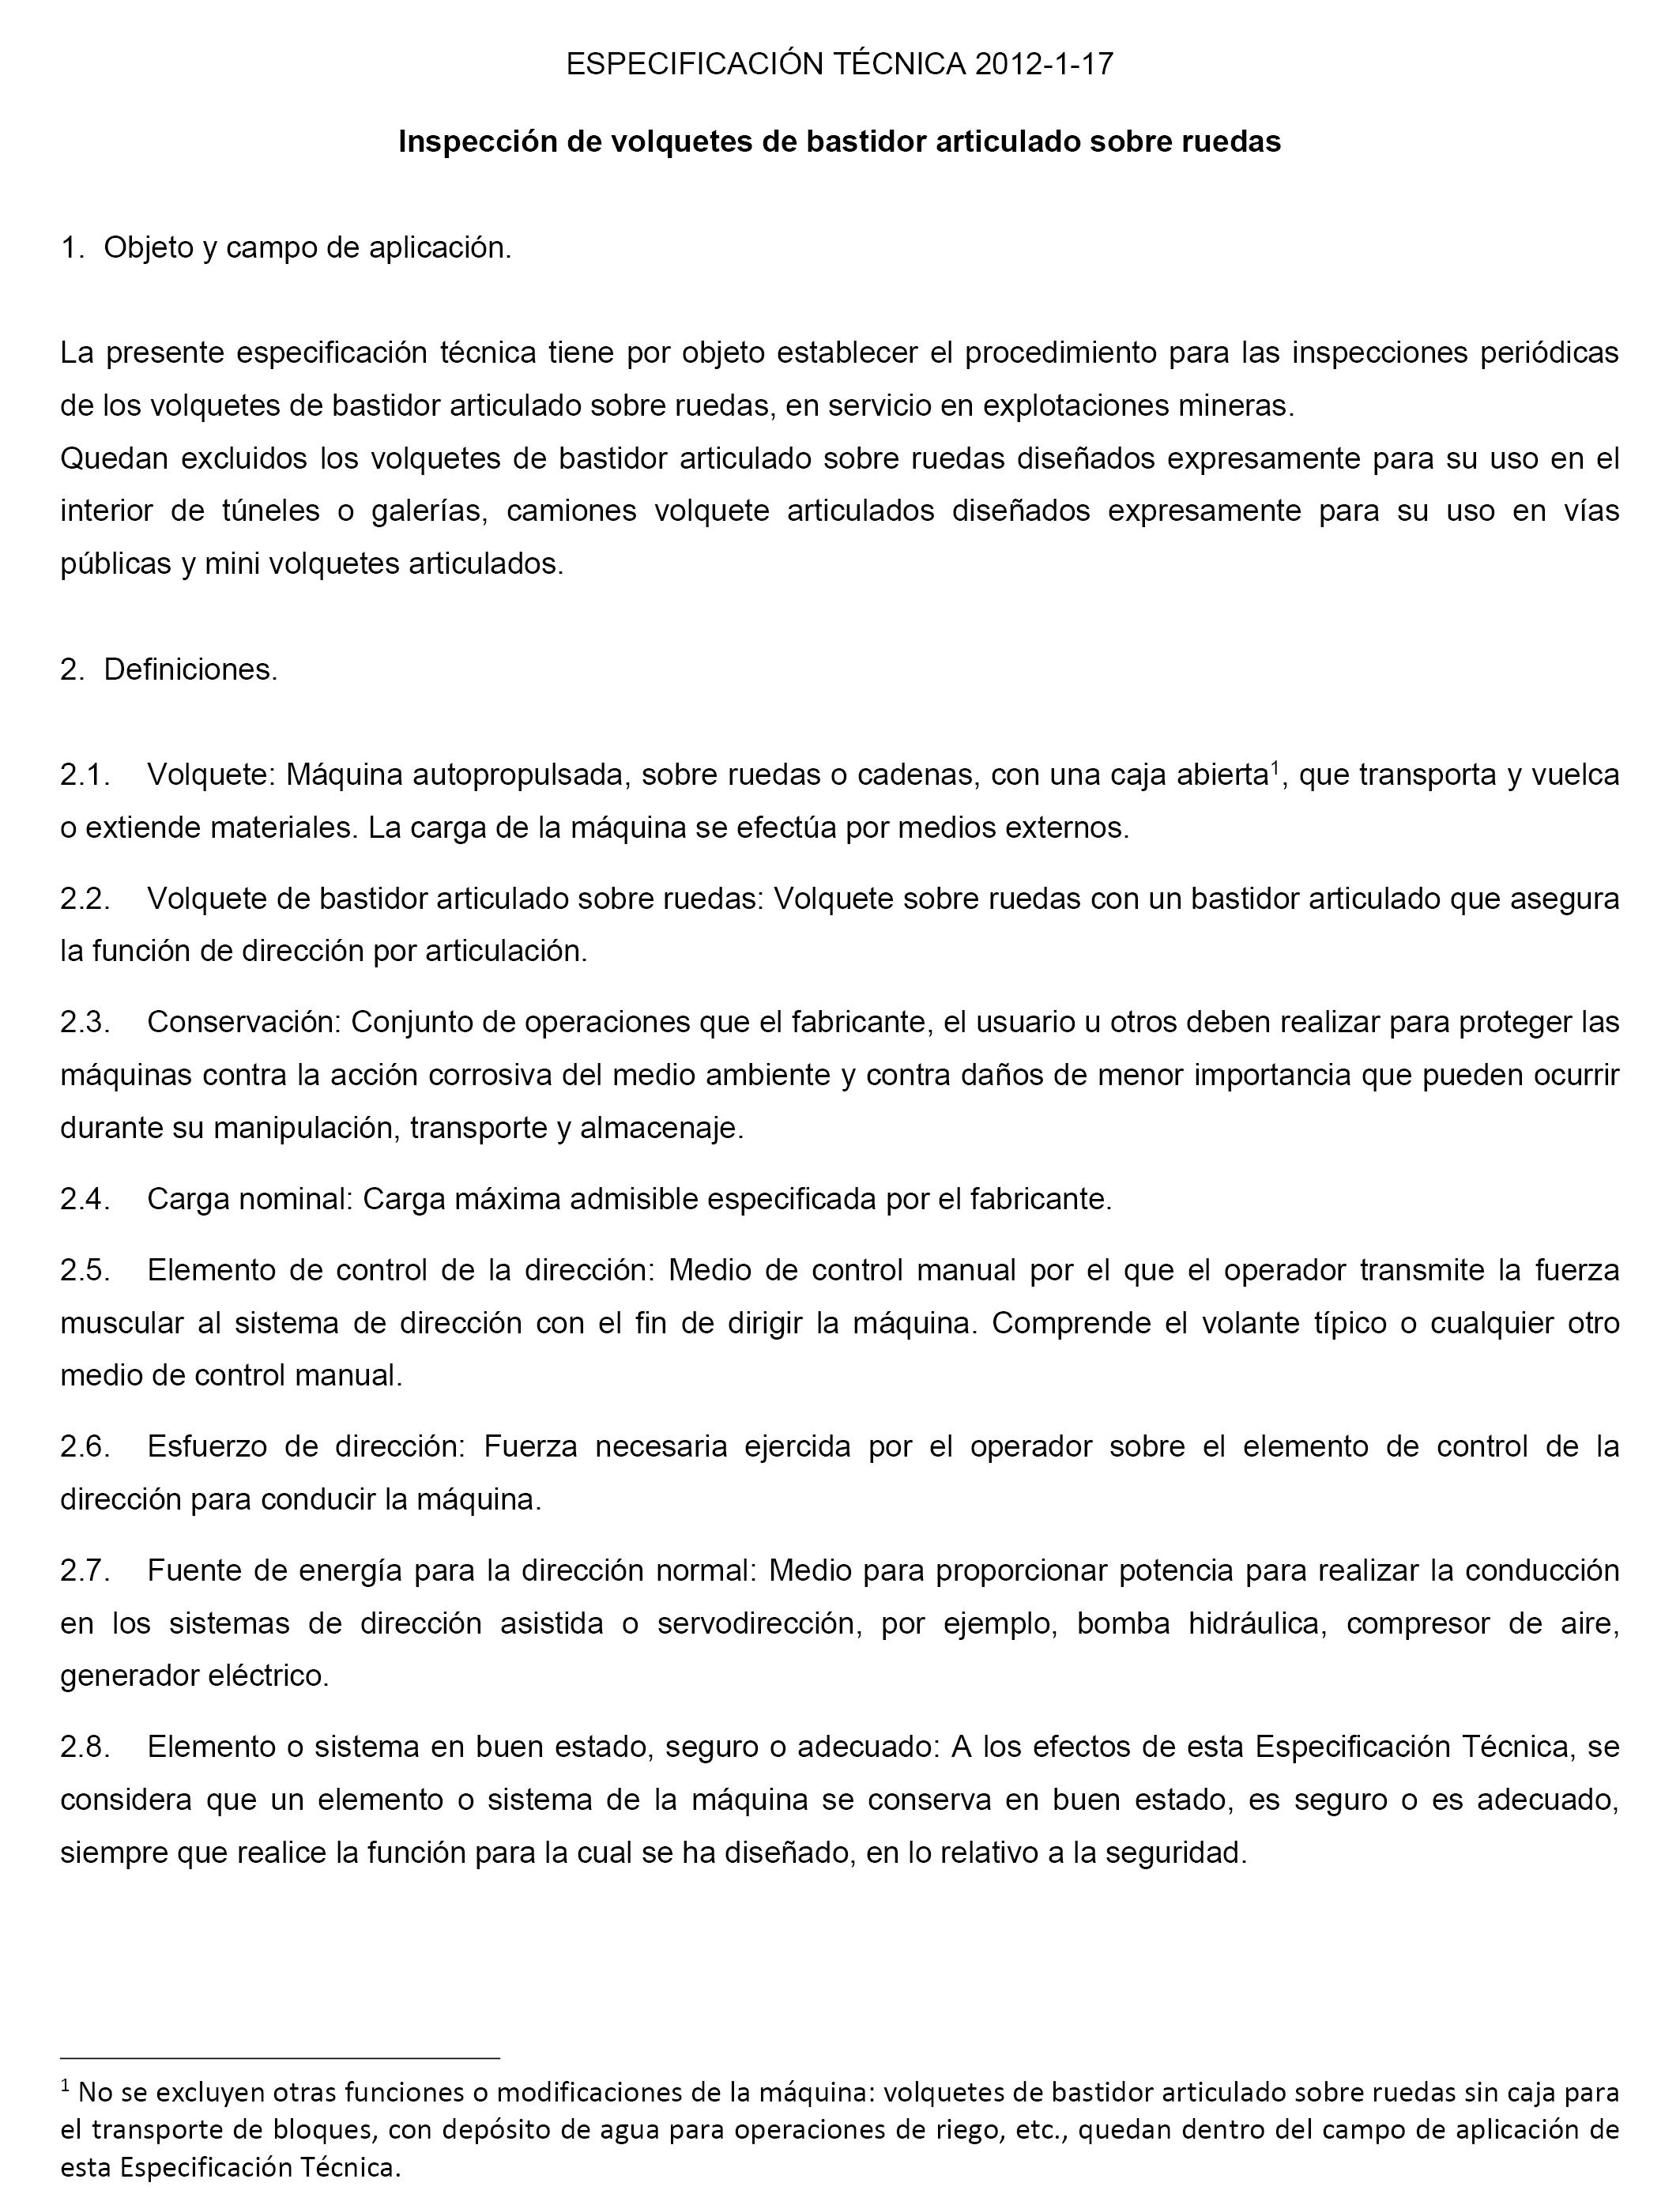 BOE.es - Documento BOE-A-2017-11054